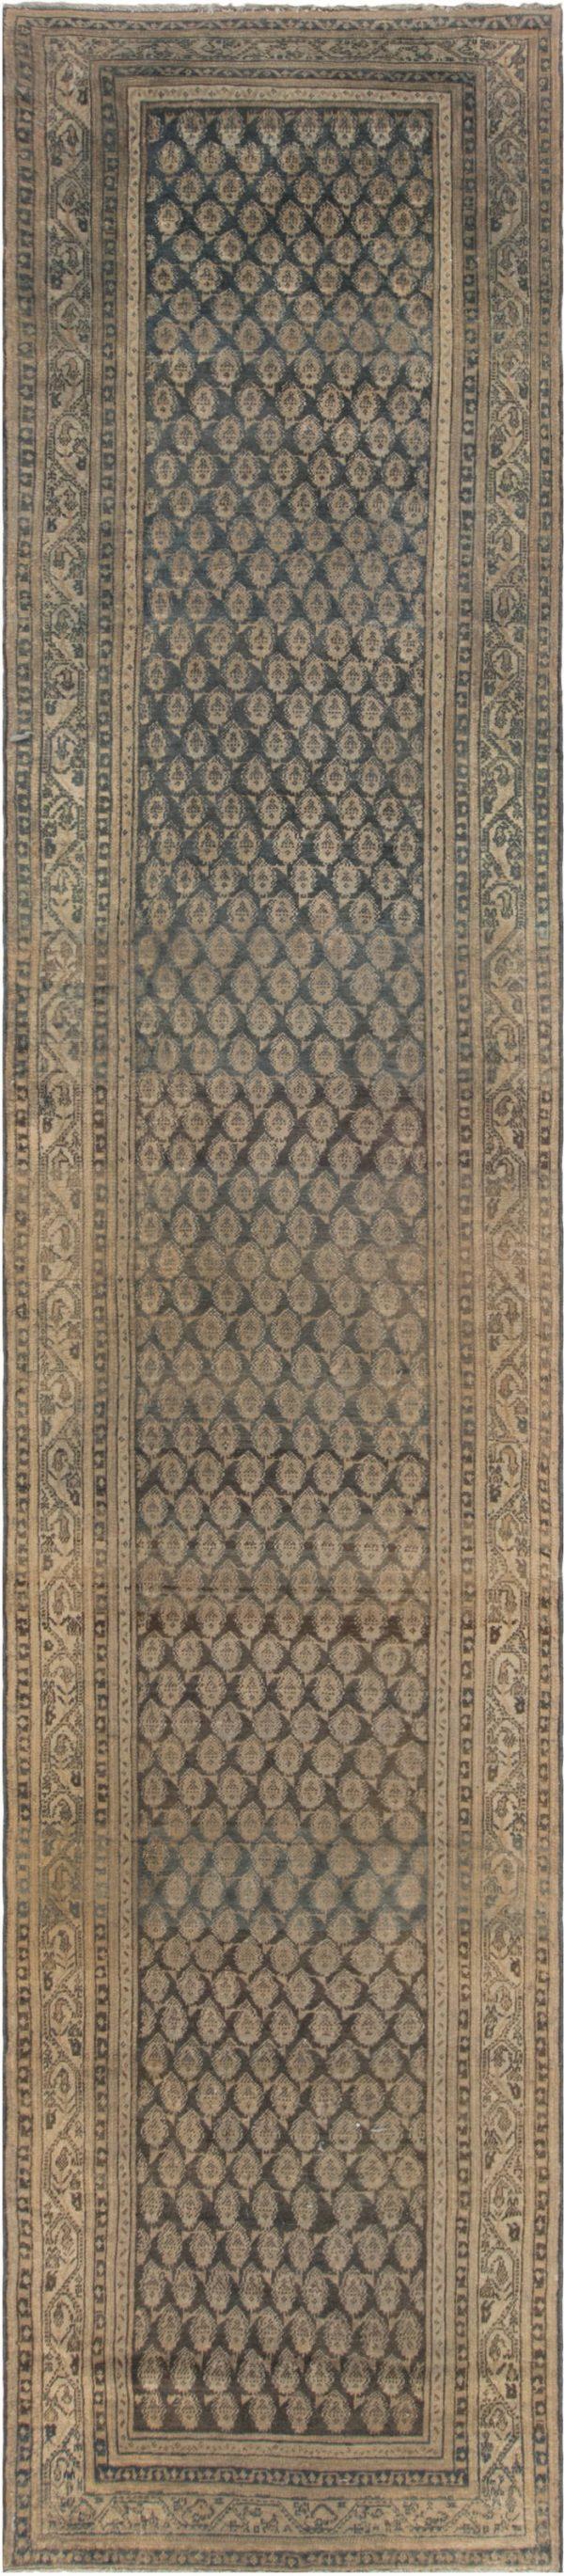 Antigüedades Malayer Runner BB5266